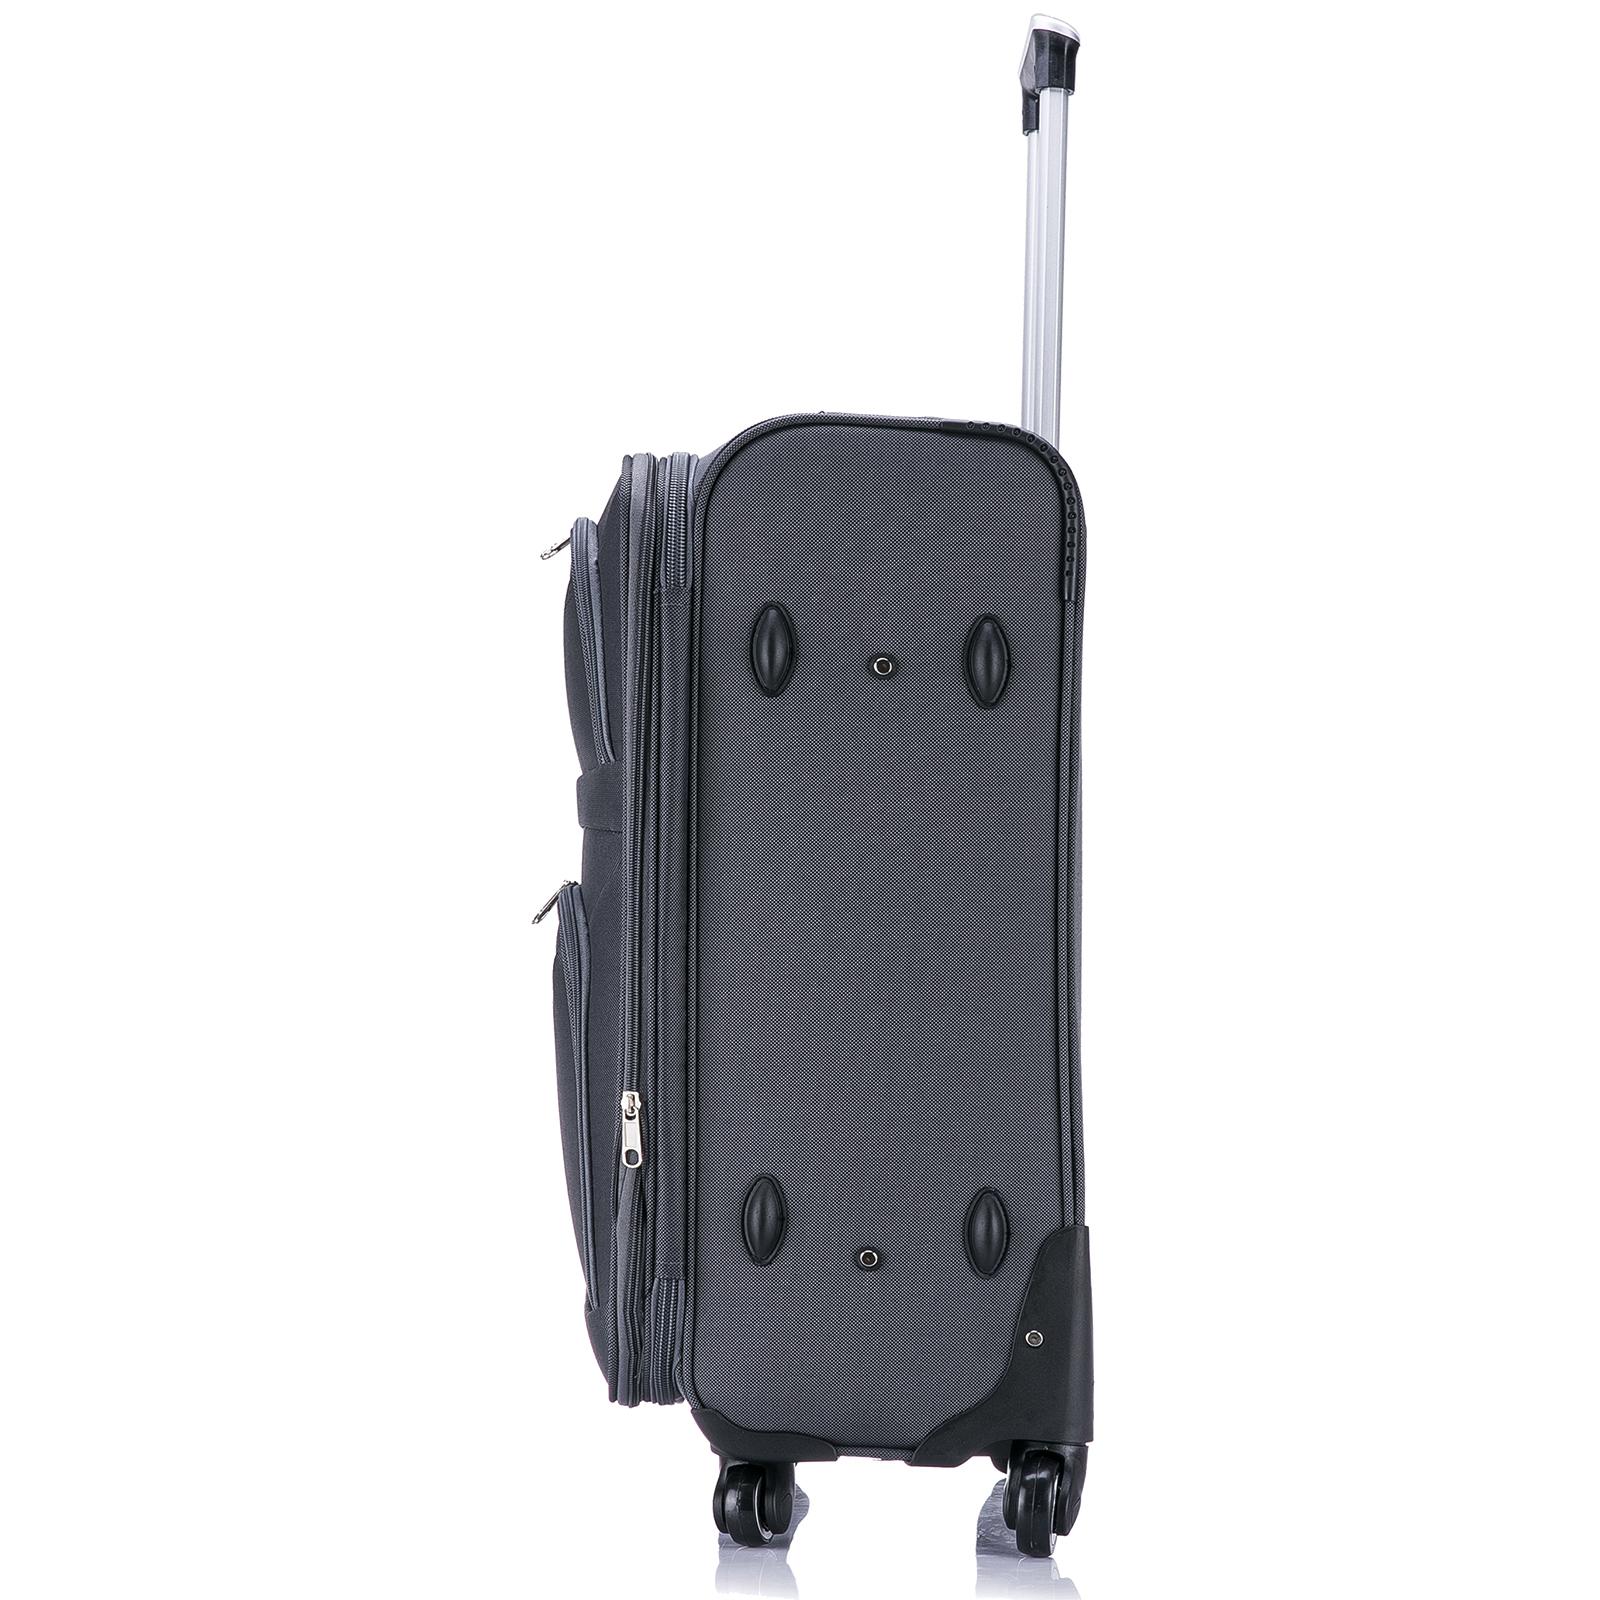 koffer trolley weichgep ck reisekoffer stoff handgep ck. Black Bedroom Furniture Sets. Home Design Ideas